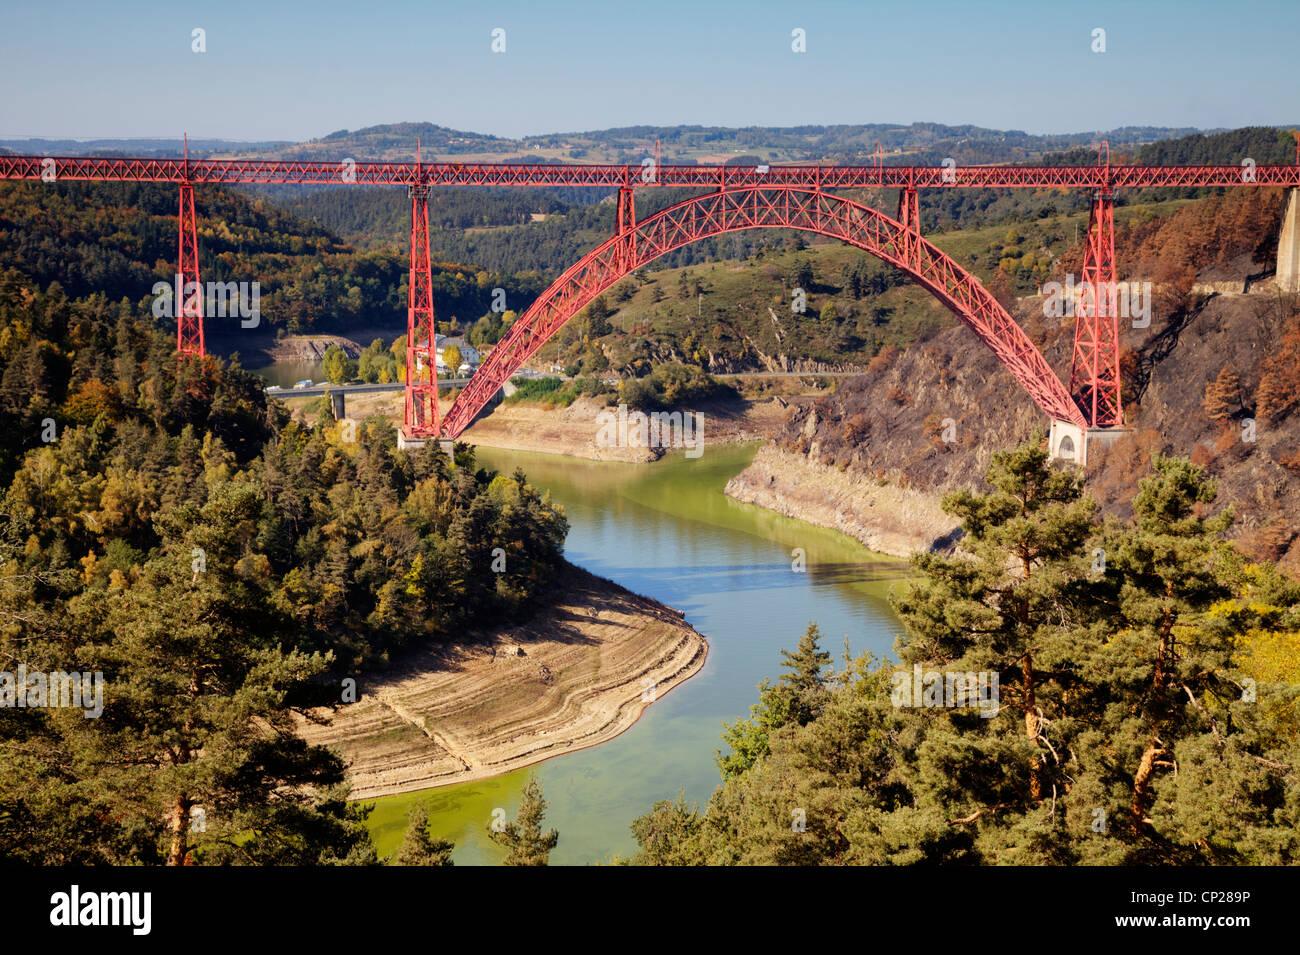 The Garabit Viaduct, designed by Gustave Eiffel, spans the River Truyere at Garabit, Auvergne, France. - Stock Image